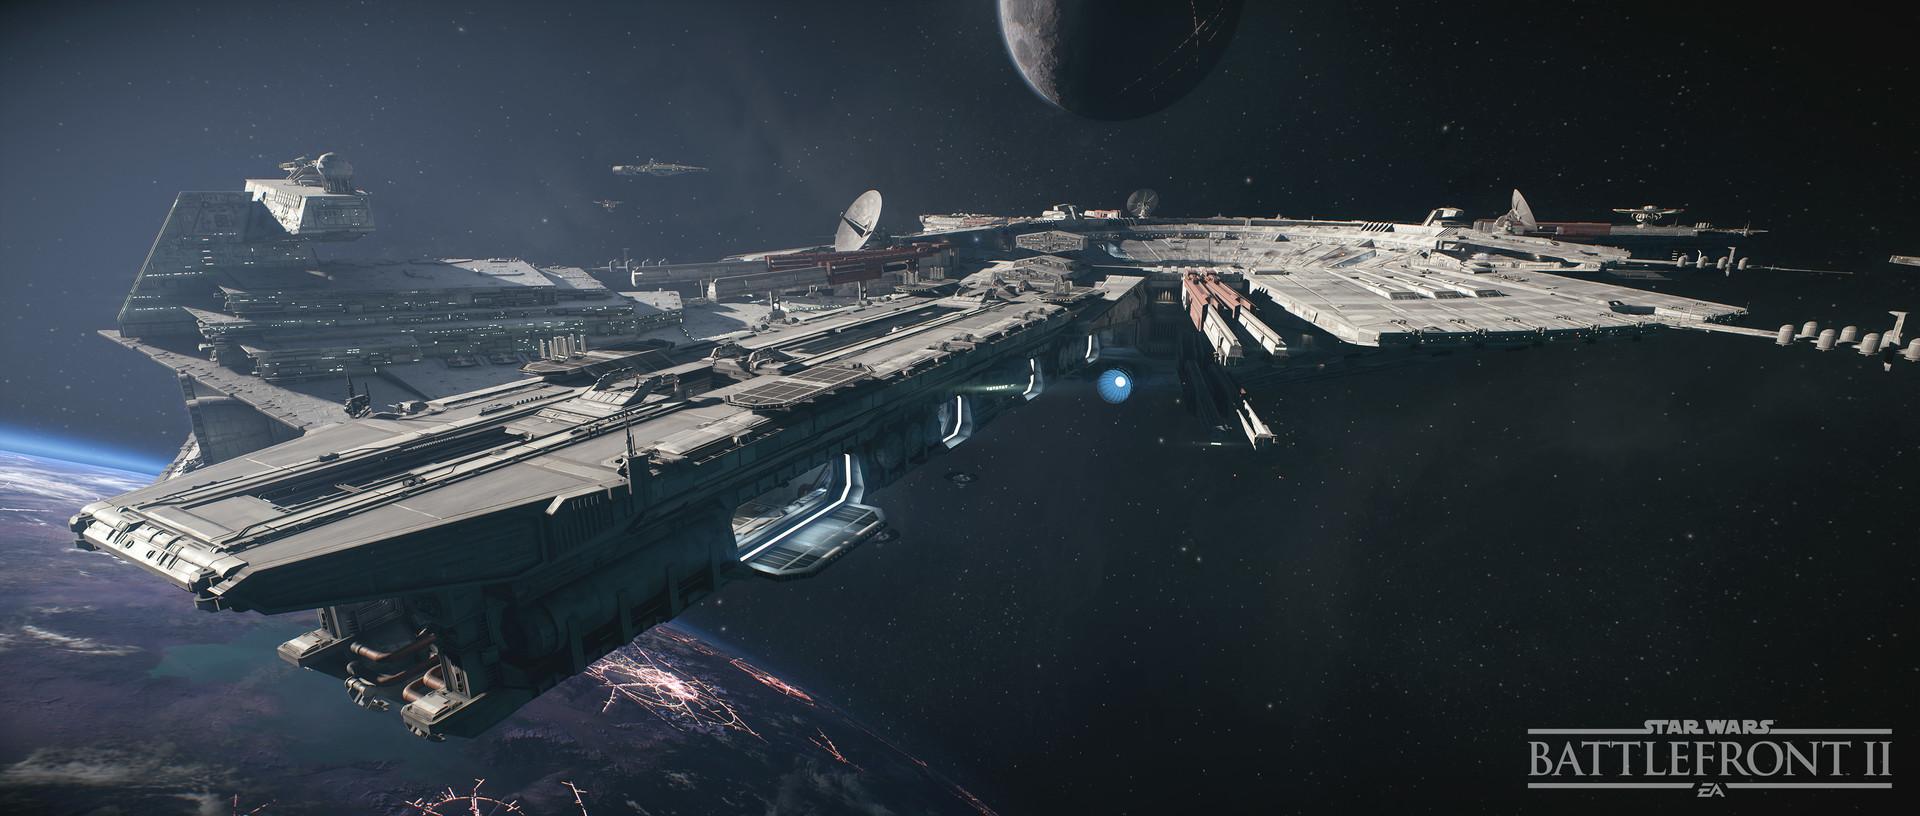 Darius kalinauskas fondor dock starwars conceptart battlefront 4